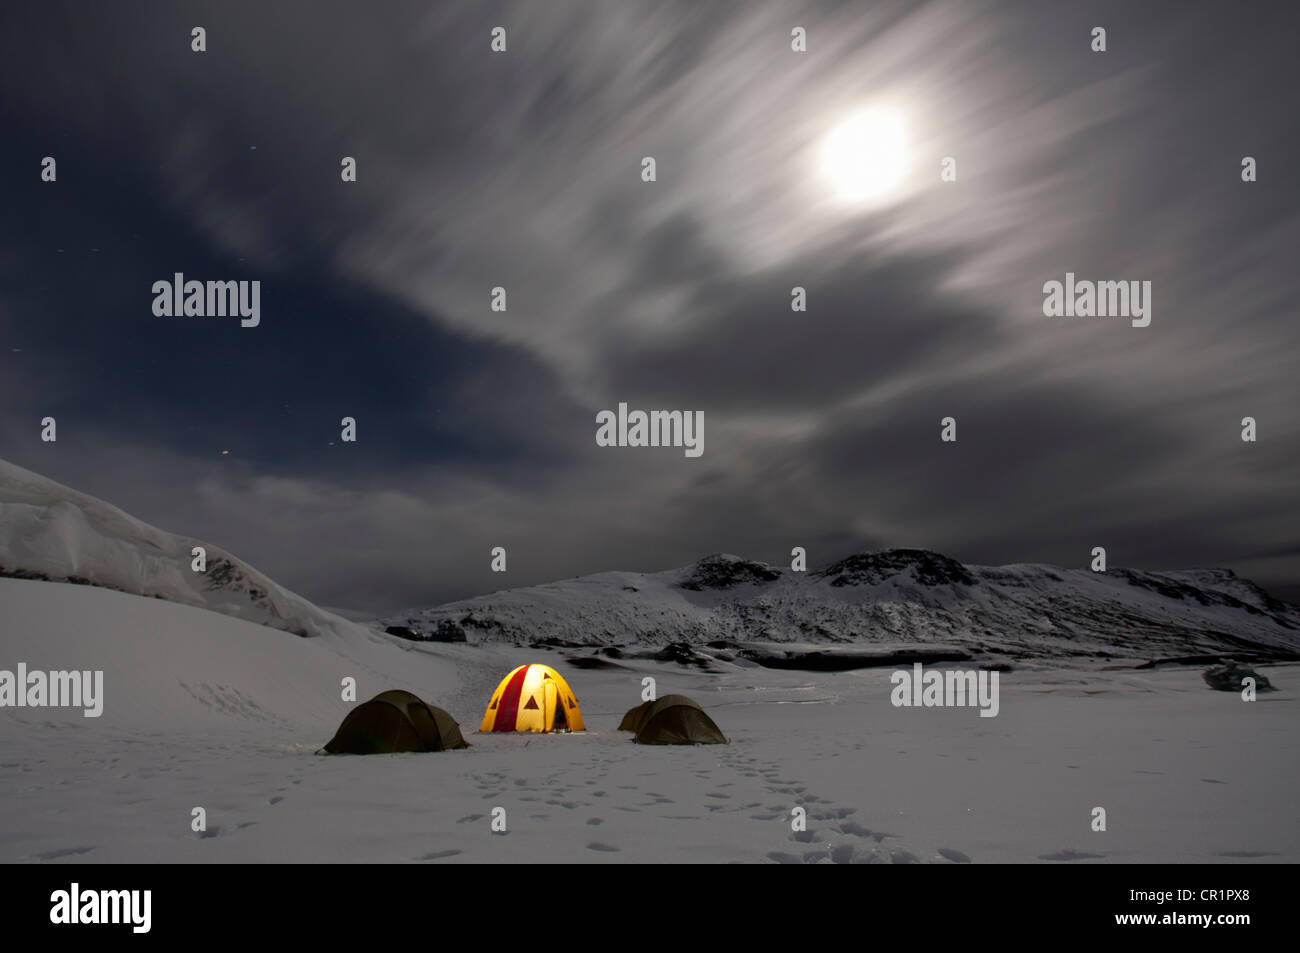 Illuminated tent at glacier campsite Stock Photo